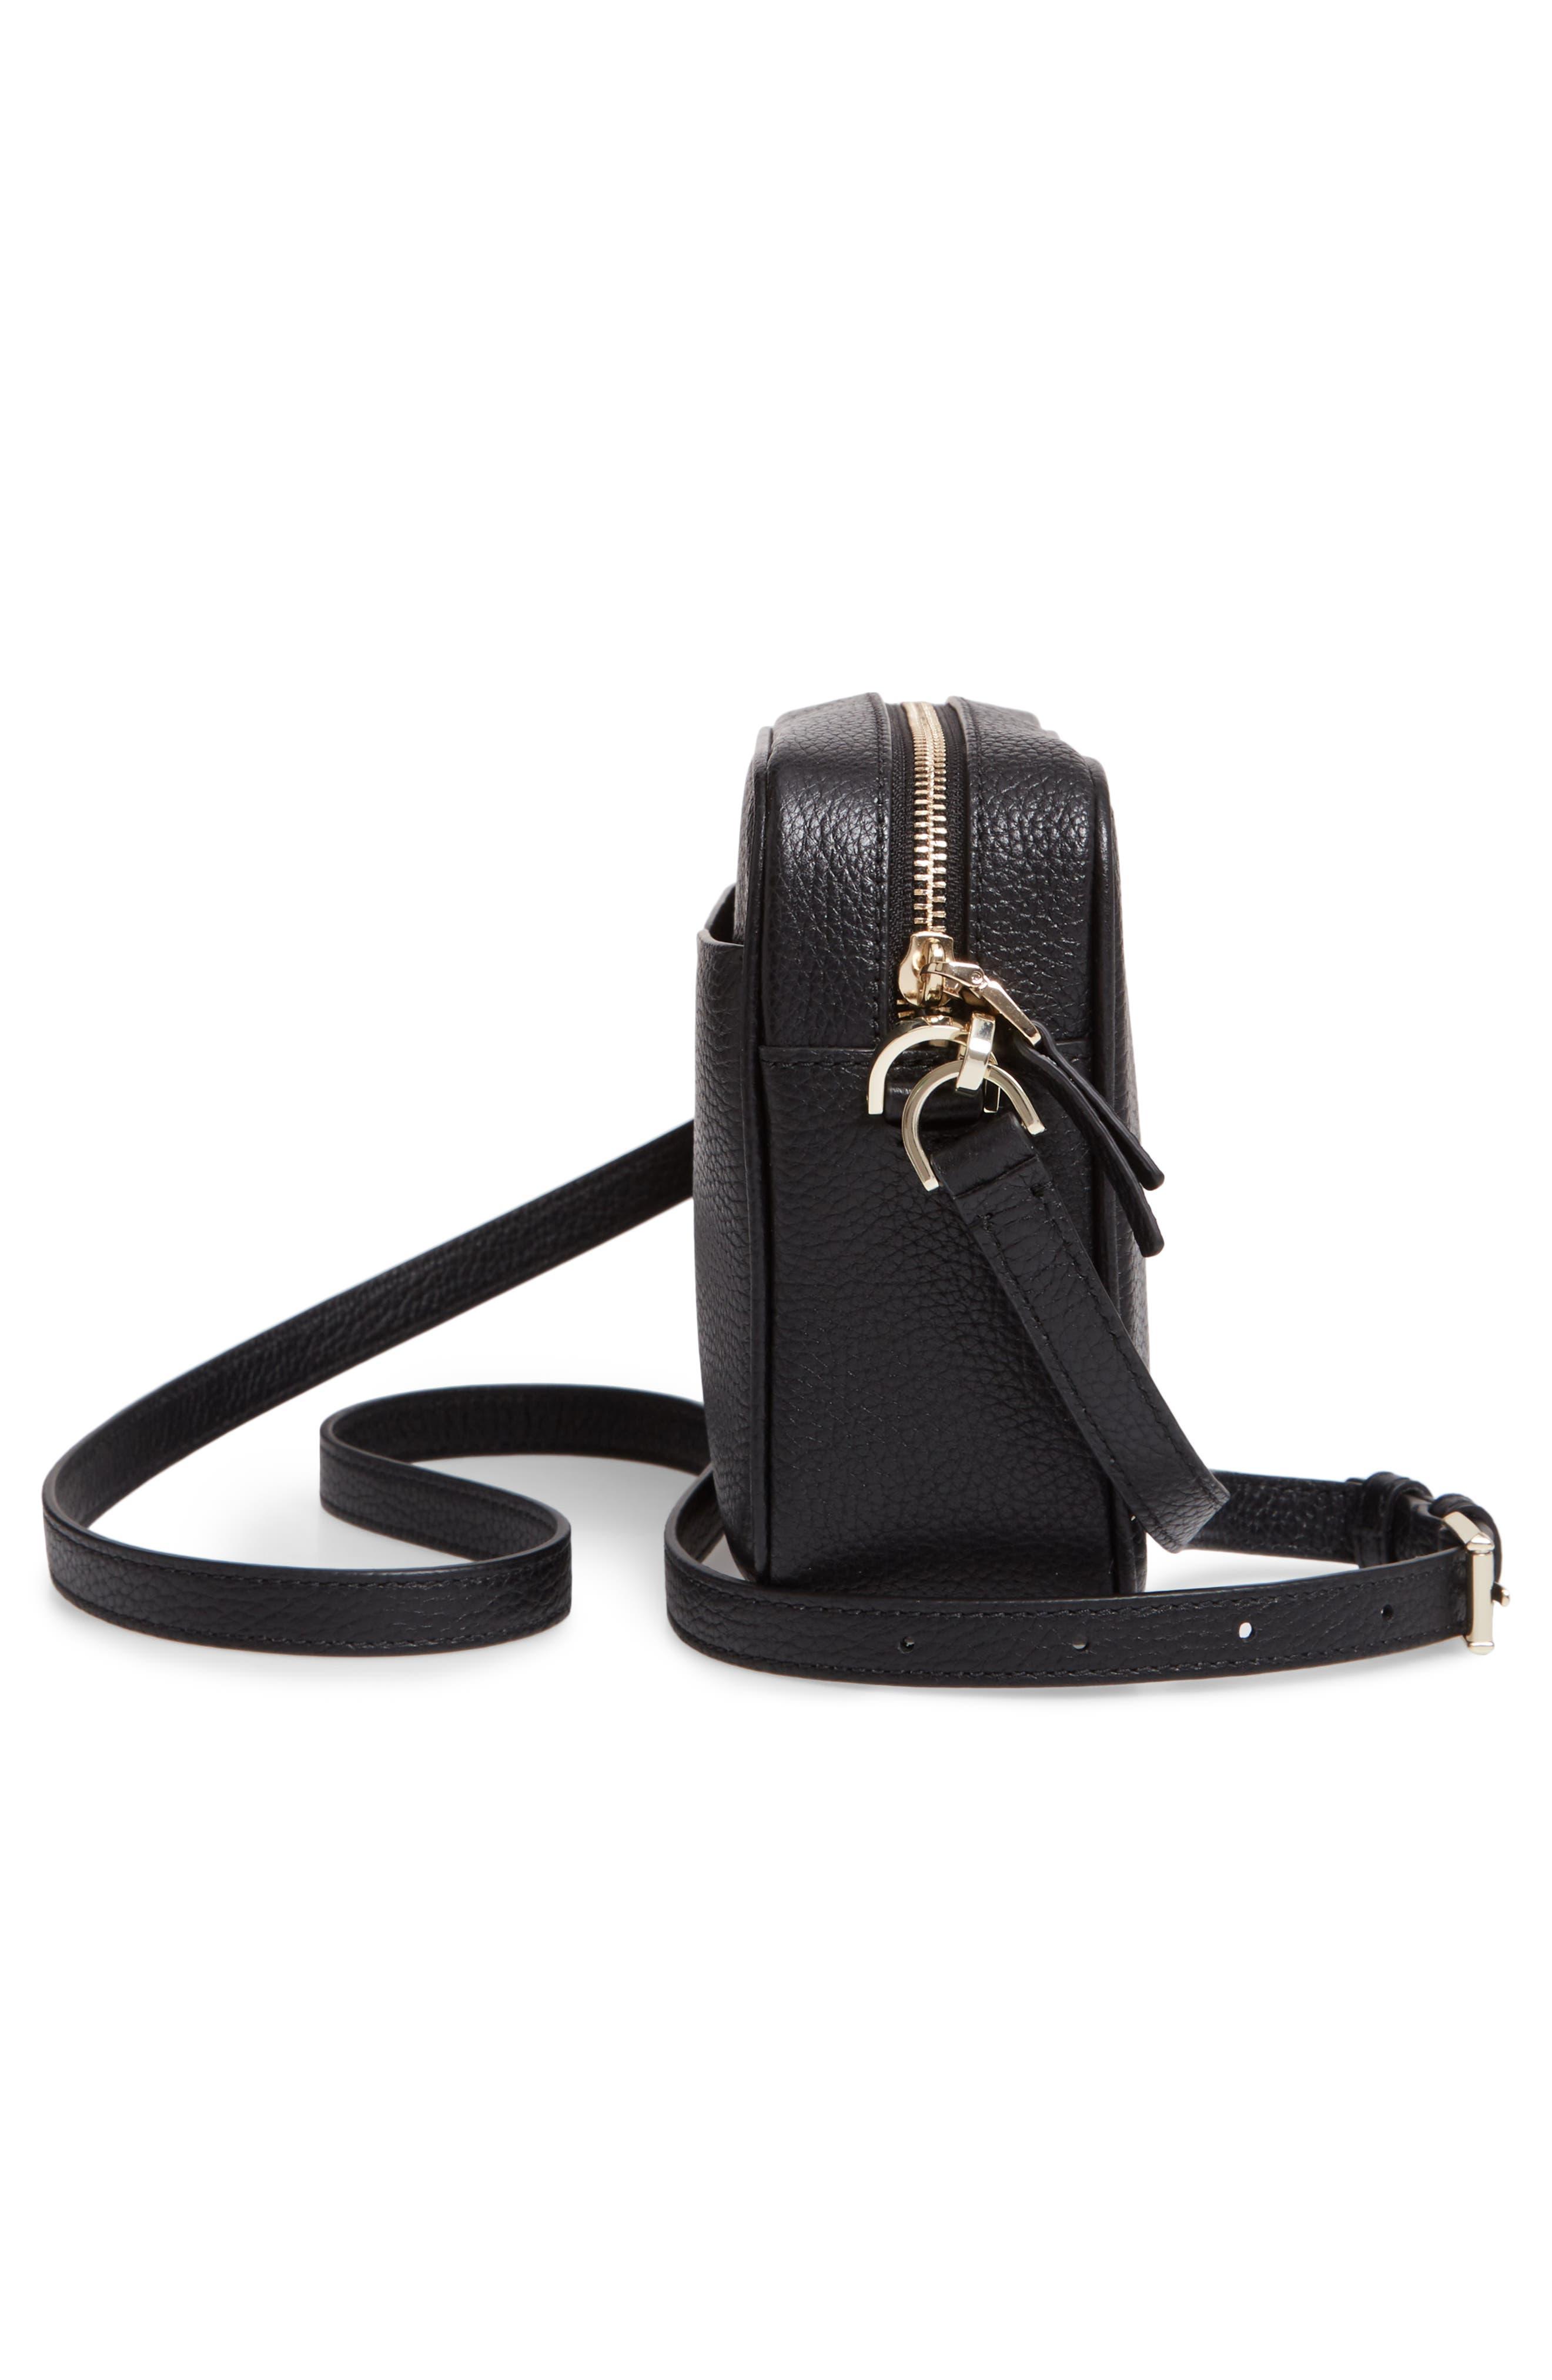 KATE SPADE NEW YORK, medium polly leather camera bag, Alternate thumbnail 6, color, BLACK